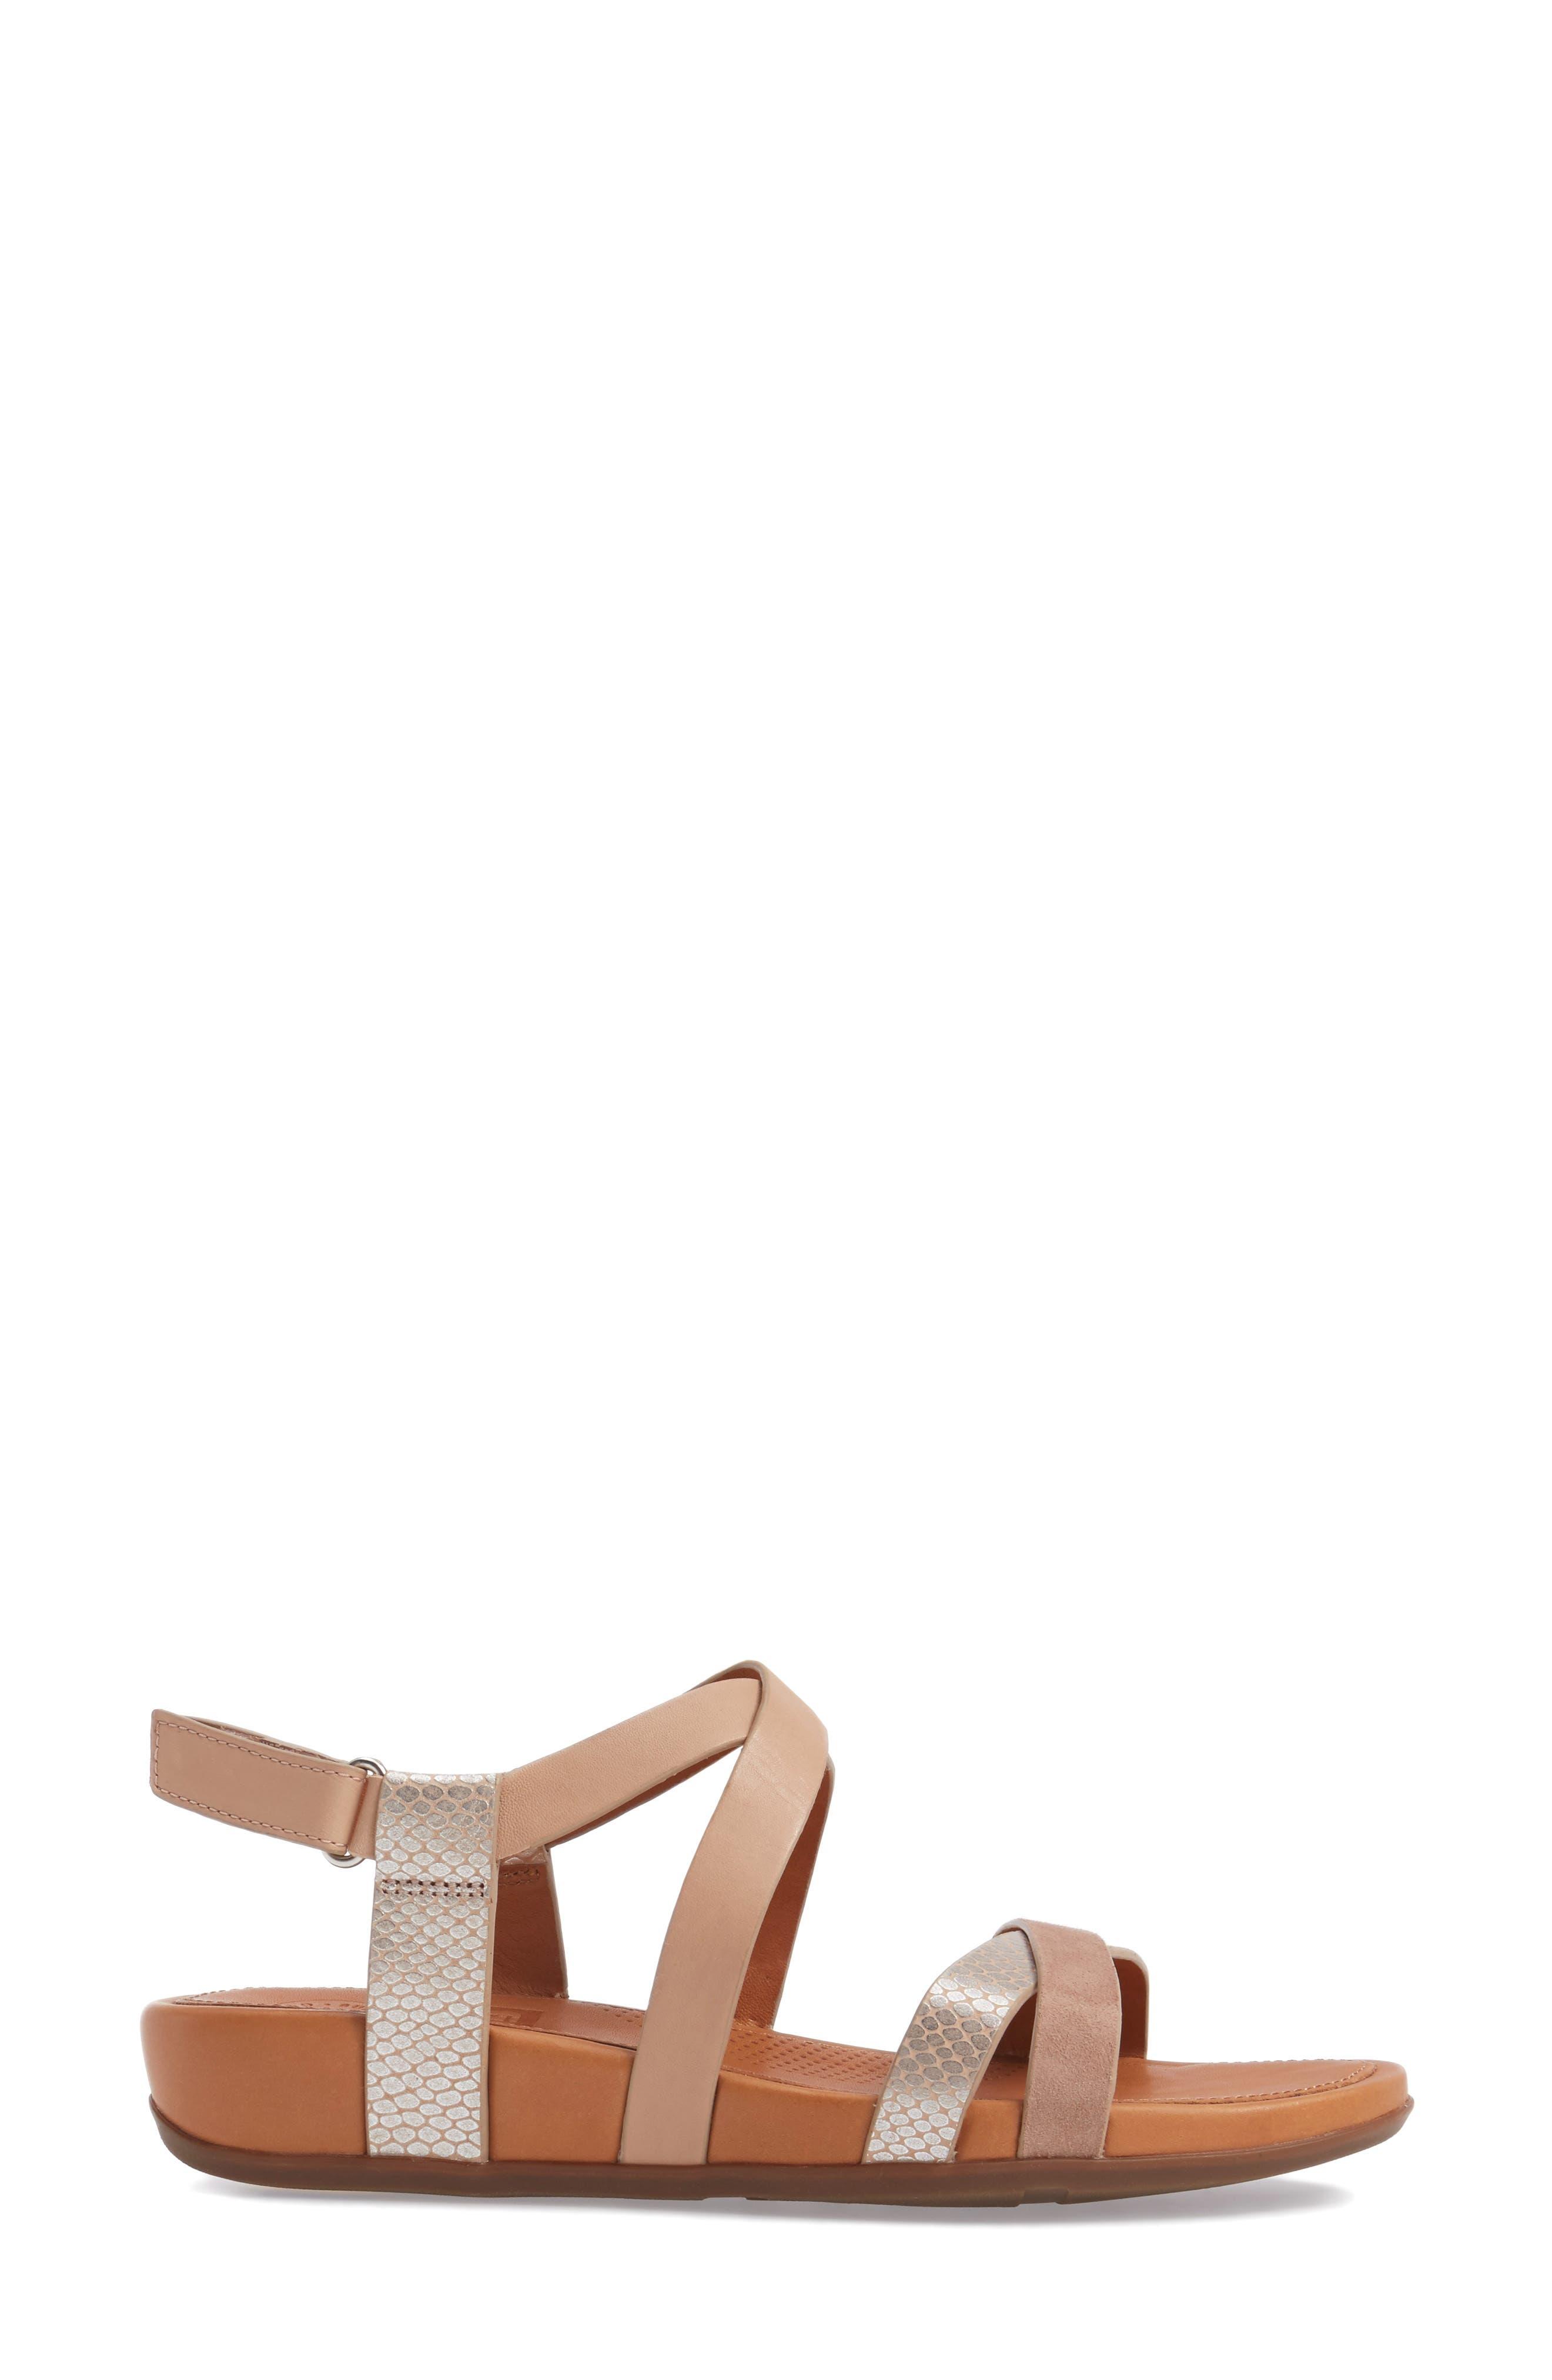 Lumy Crisscross Sandal,                             Alternate thumbnail 3, color,                             290